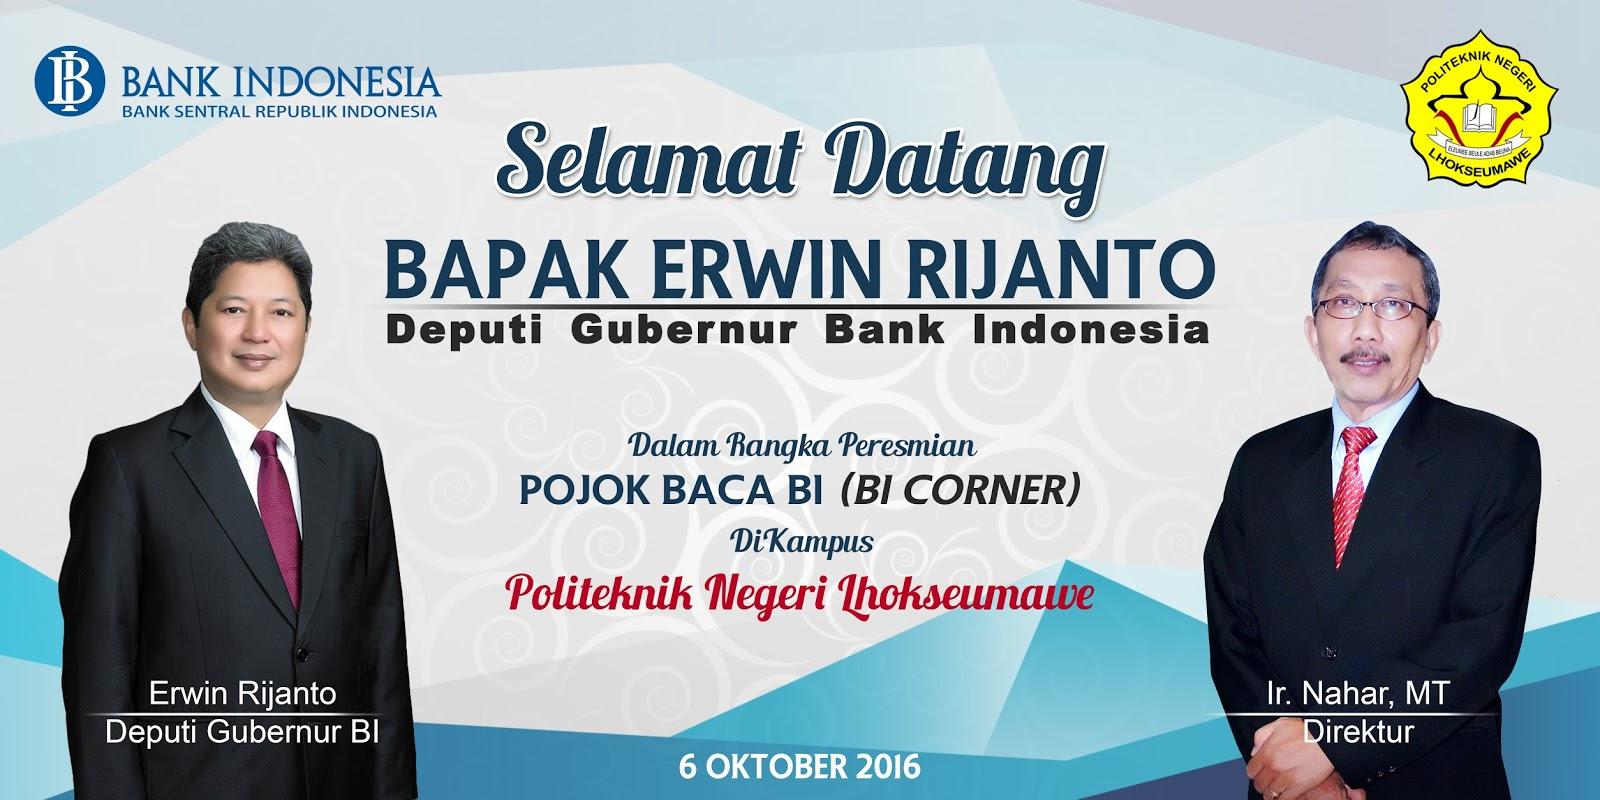 selamat datang bapak erwin rijanto di pojok baca bank indonesia kbm pnl. Black Bedroom Furniture Sets. Home Design Ideas